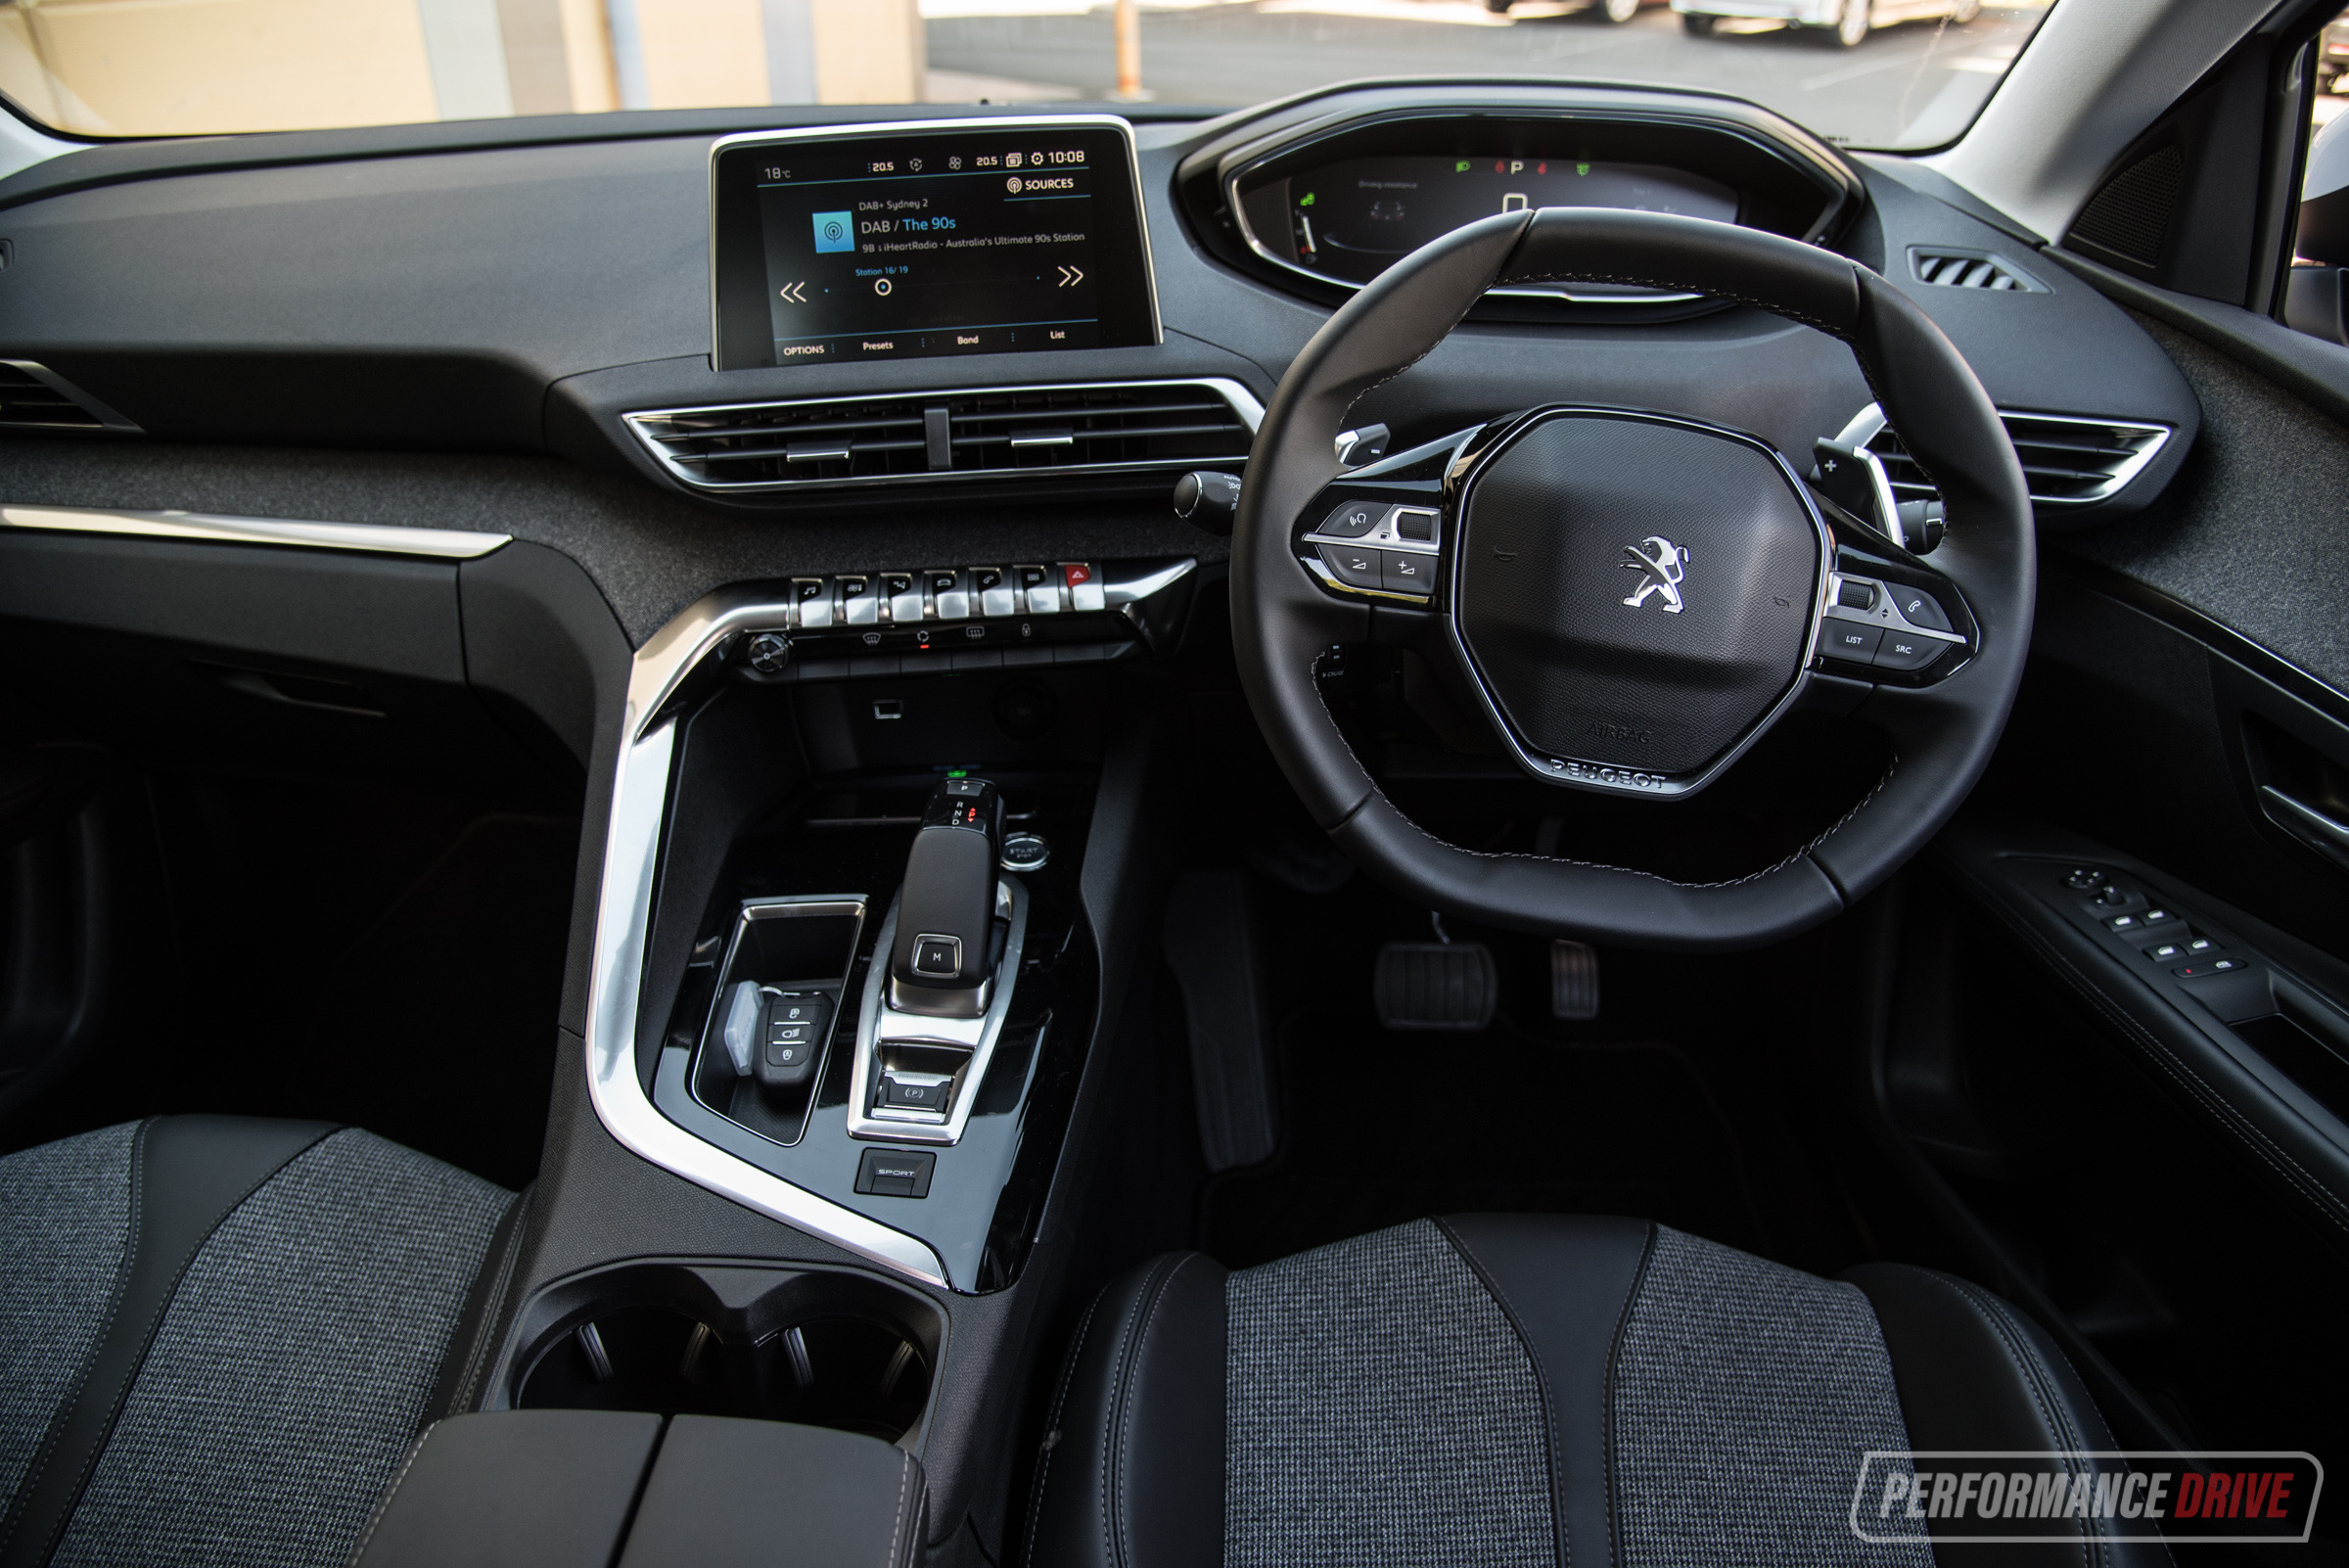 2018 Peugeot 3008 Allure review (video) | PerformanceDrive